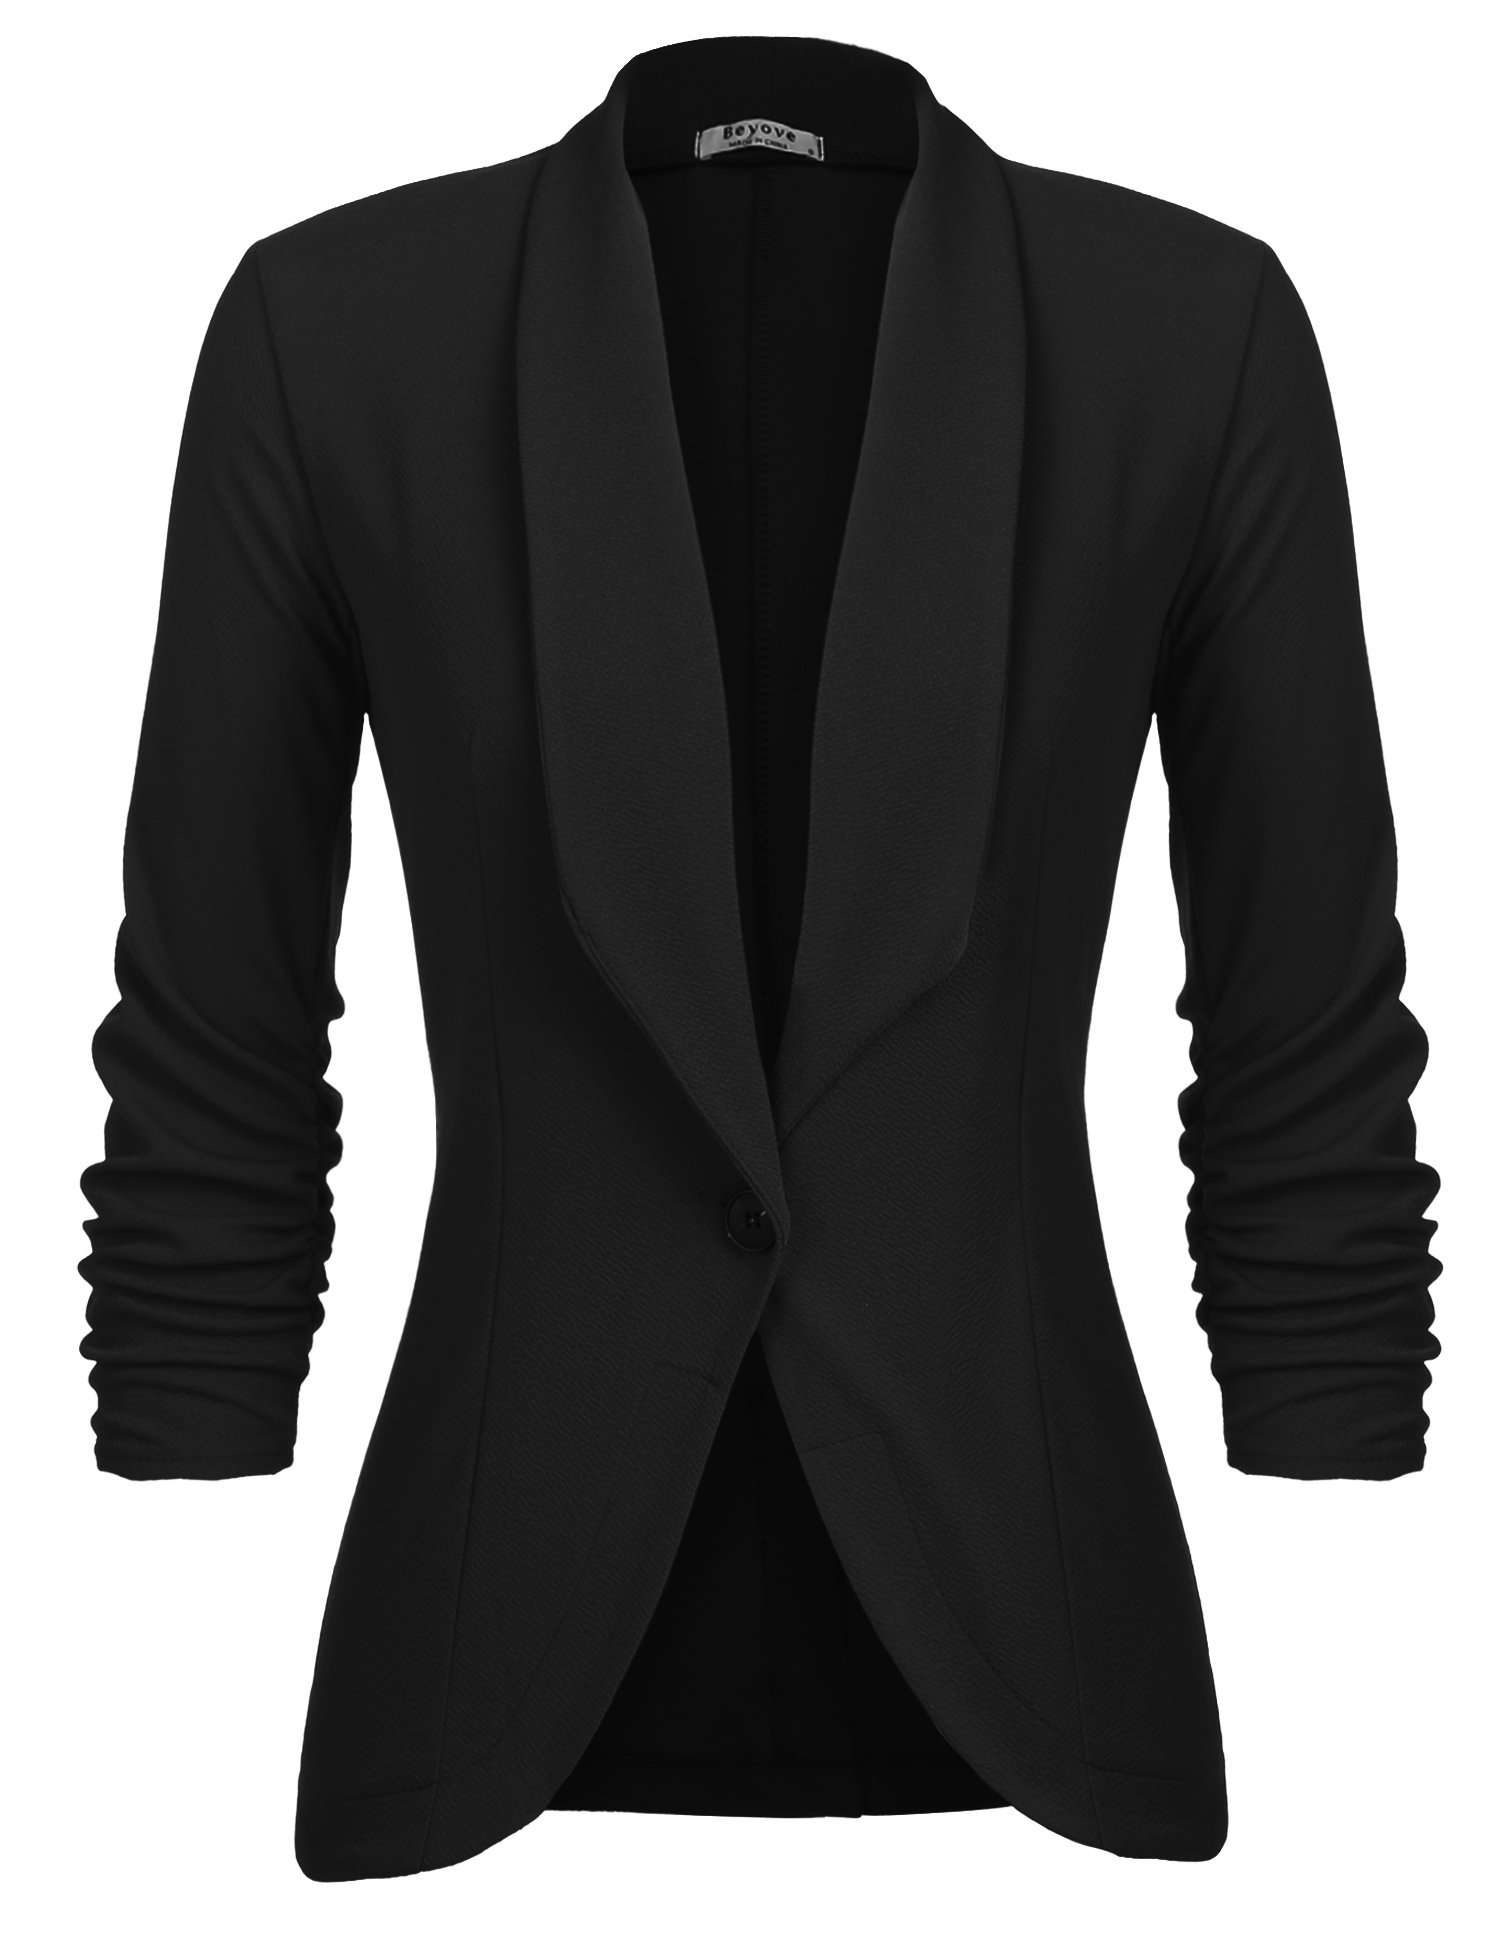 Beyove Women's 3/4 Sleeve Blazer Open Front Cardigan Jacket Work Office Blazer Black XXL